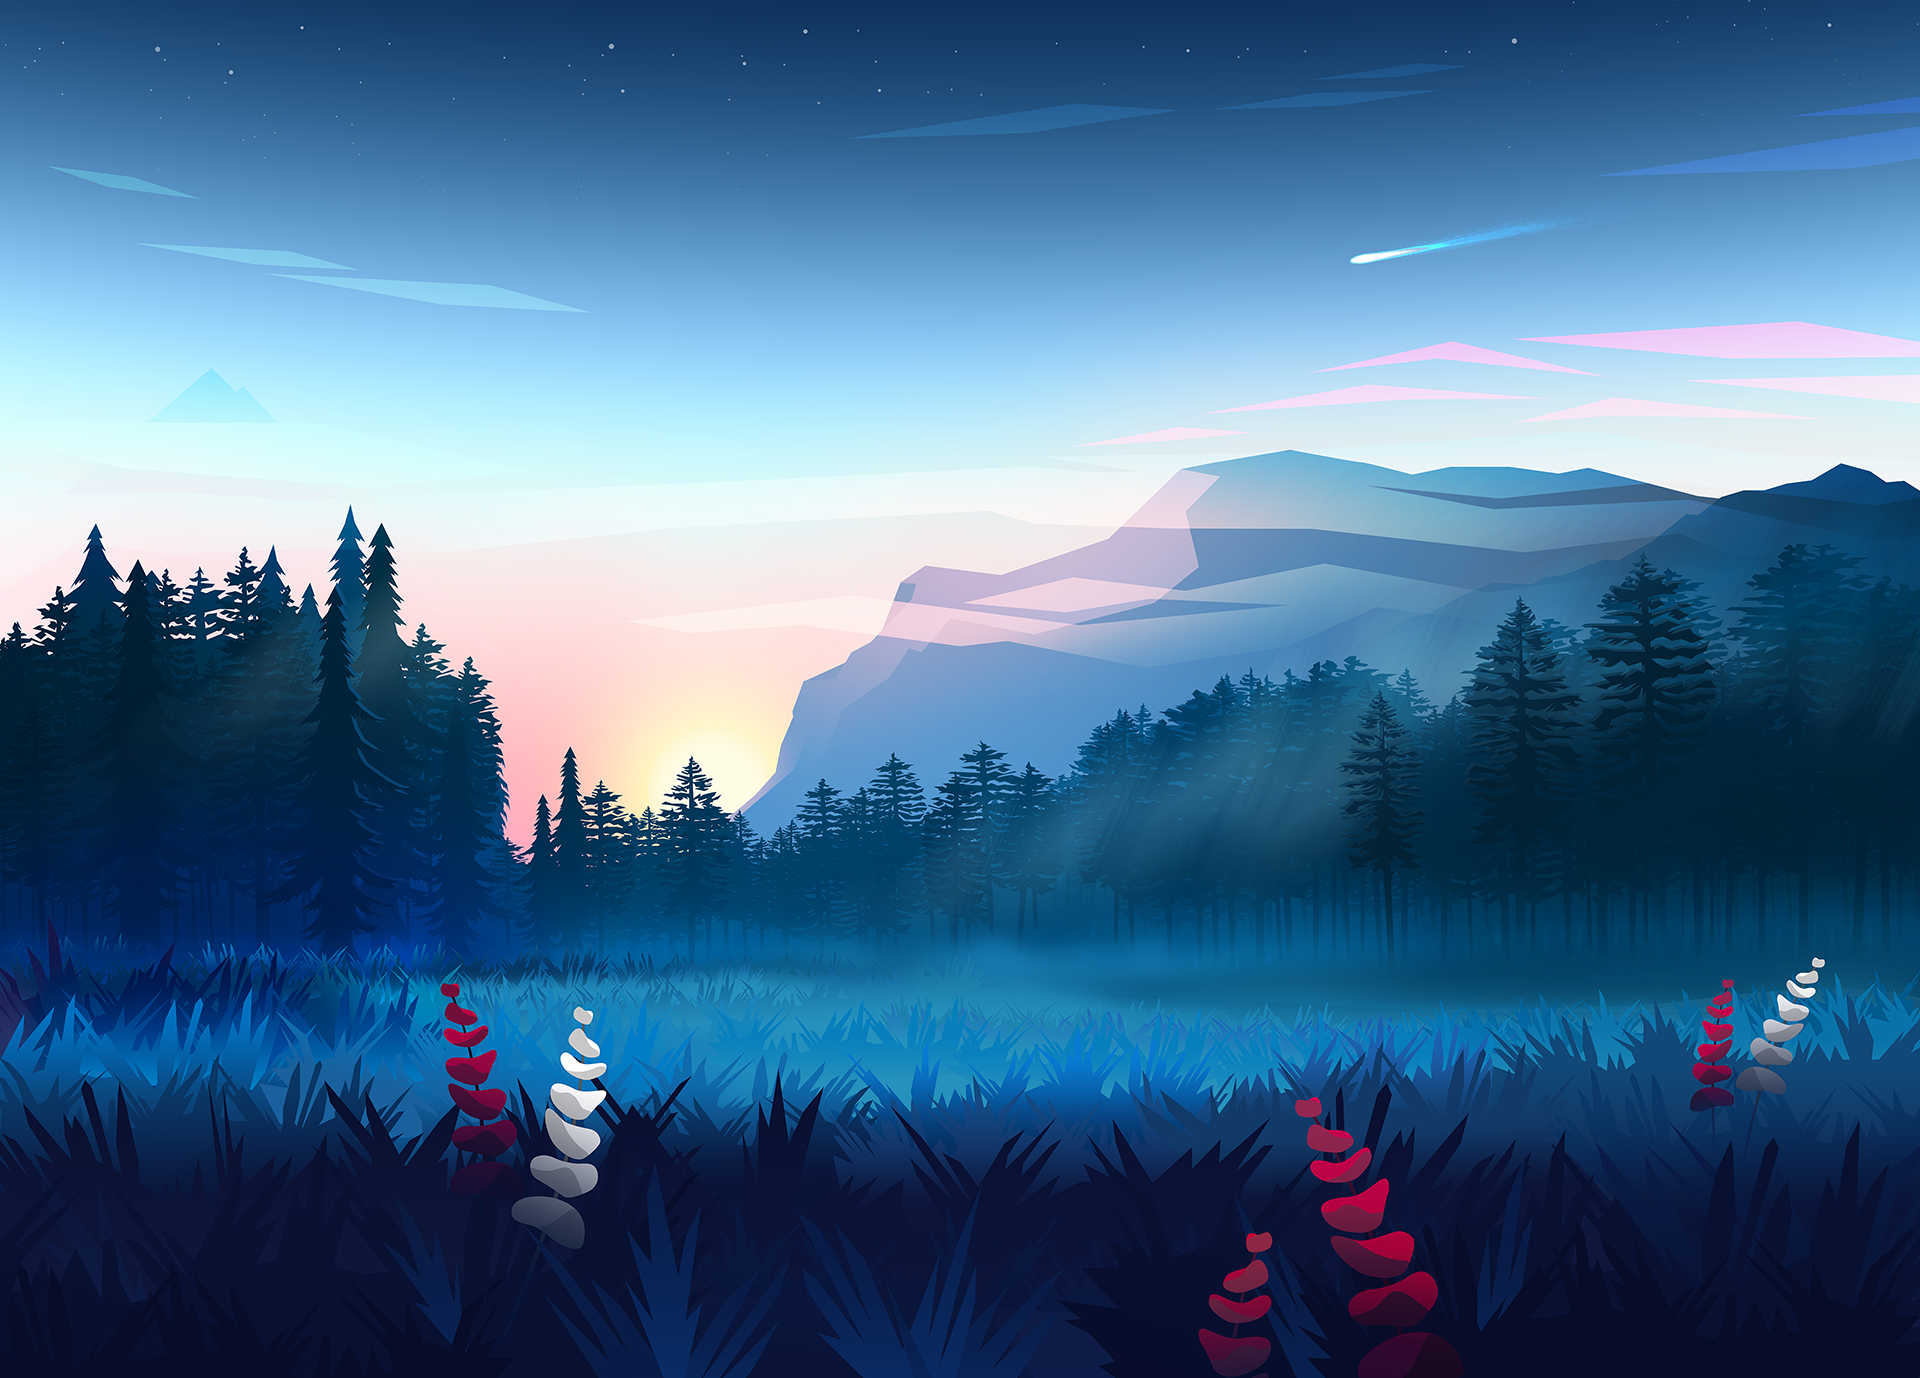 Nature Byrotek Fantasy Art Colorful Trees Wood Mountains Forest Digital Art Sunset Blue 1920x1378